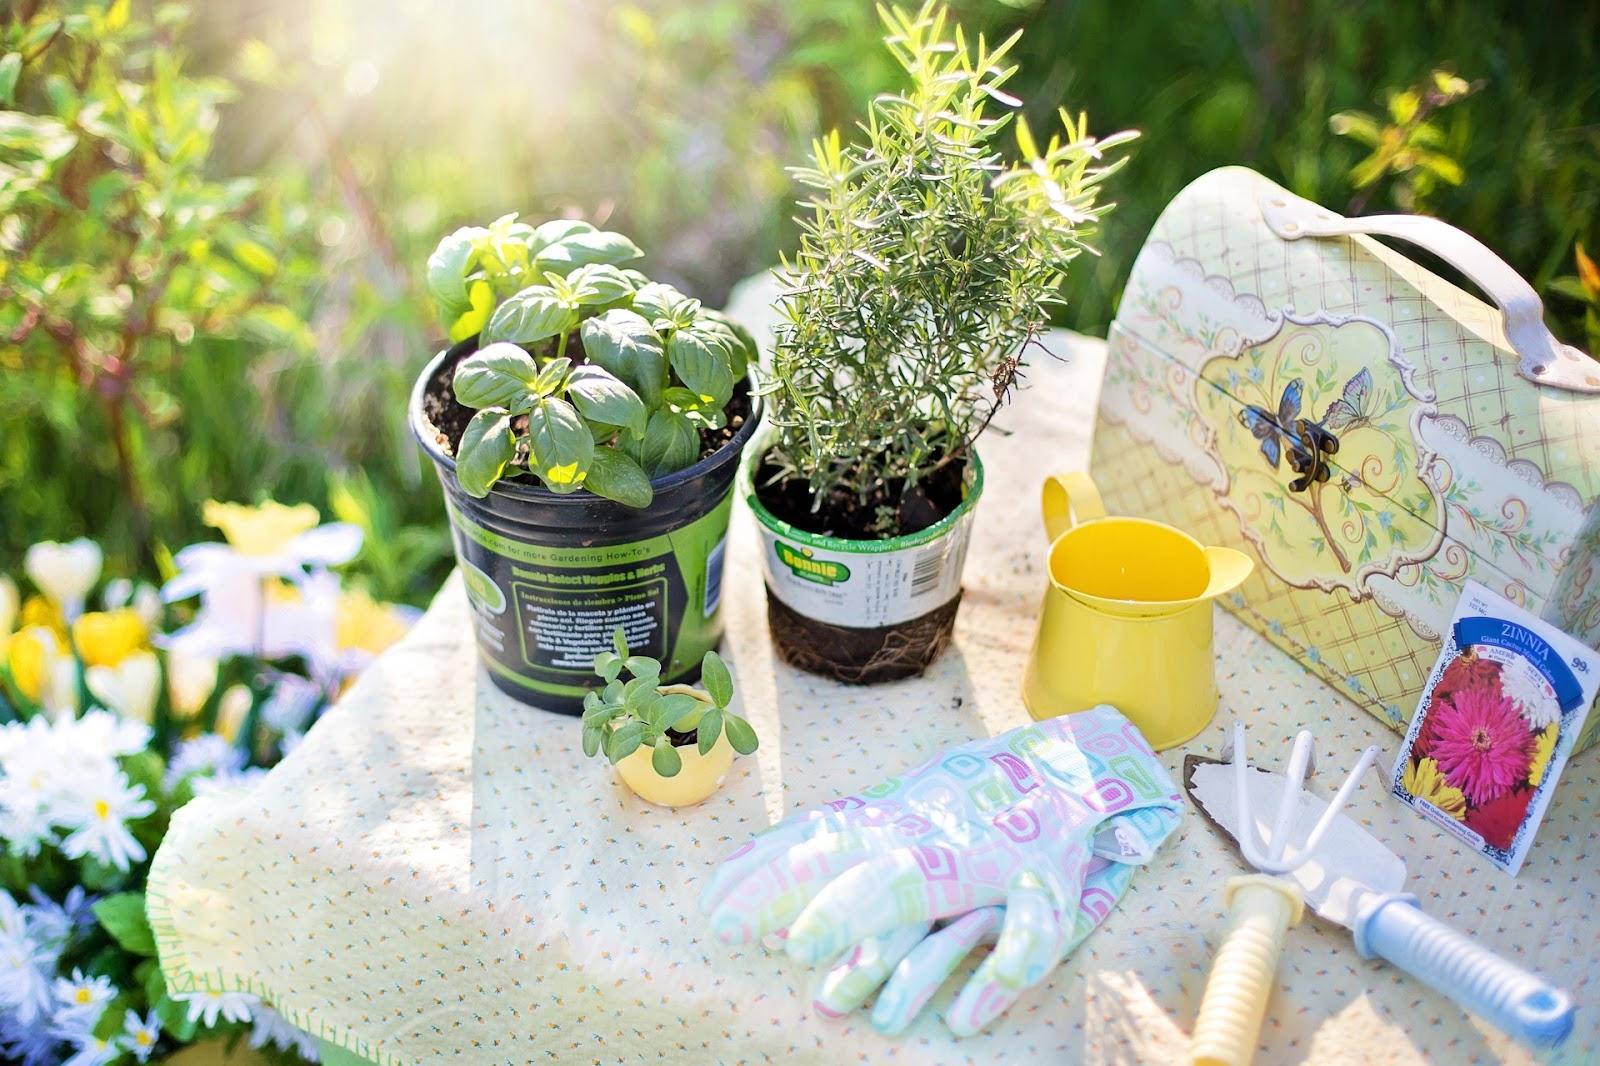 Herbs and gardening supplies